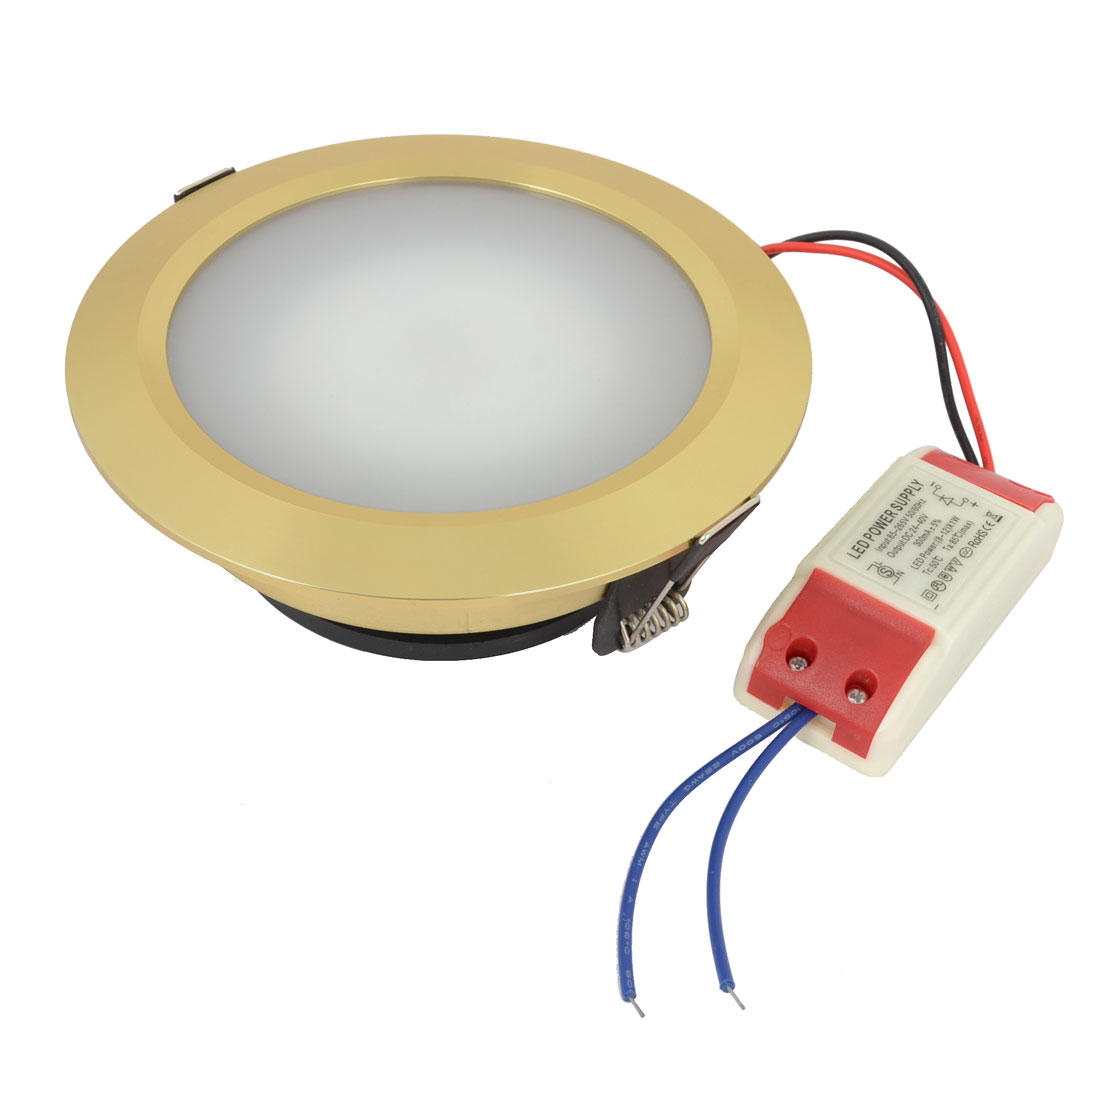 Home Office Round White 12W 24 LEDs Ceiling Down Light Lamp AC 85-265V